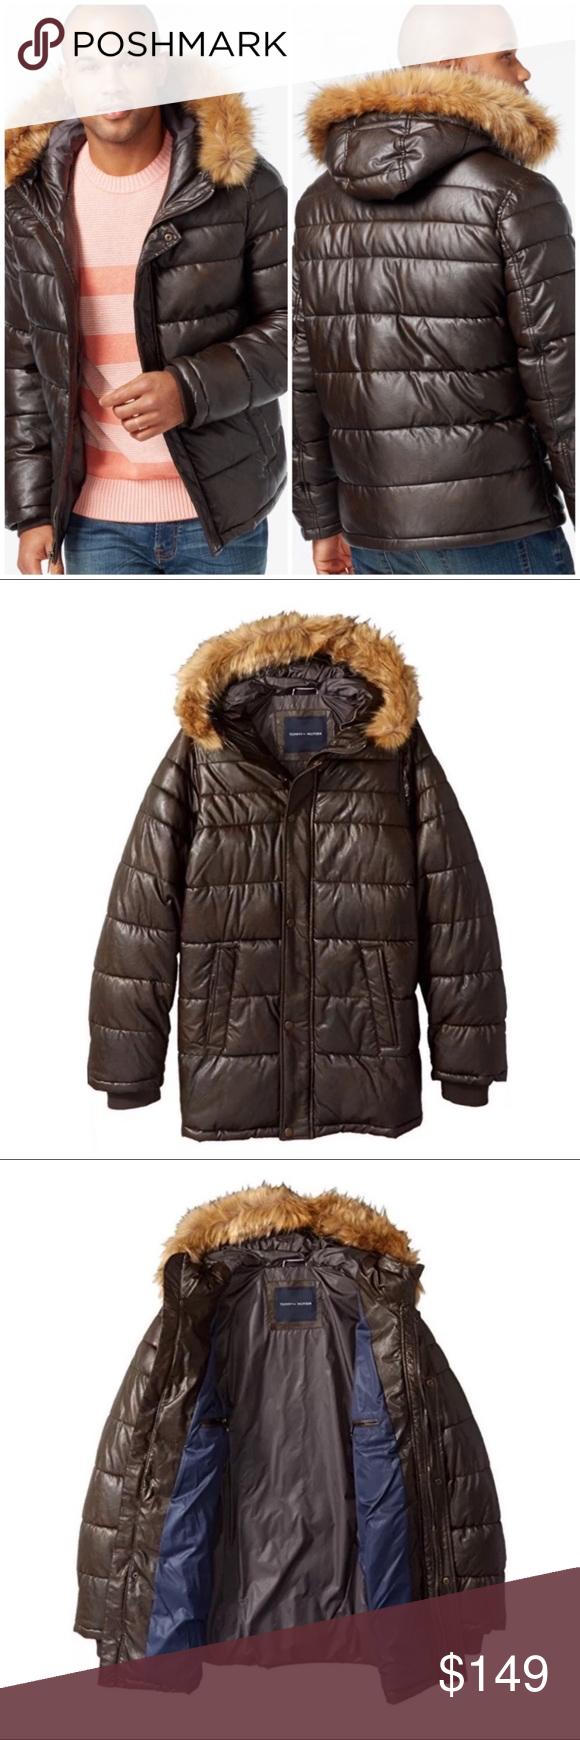 Tommy Hilfiger Leather Parka Winter Coat Fur Hood NWT